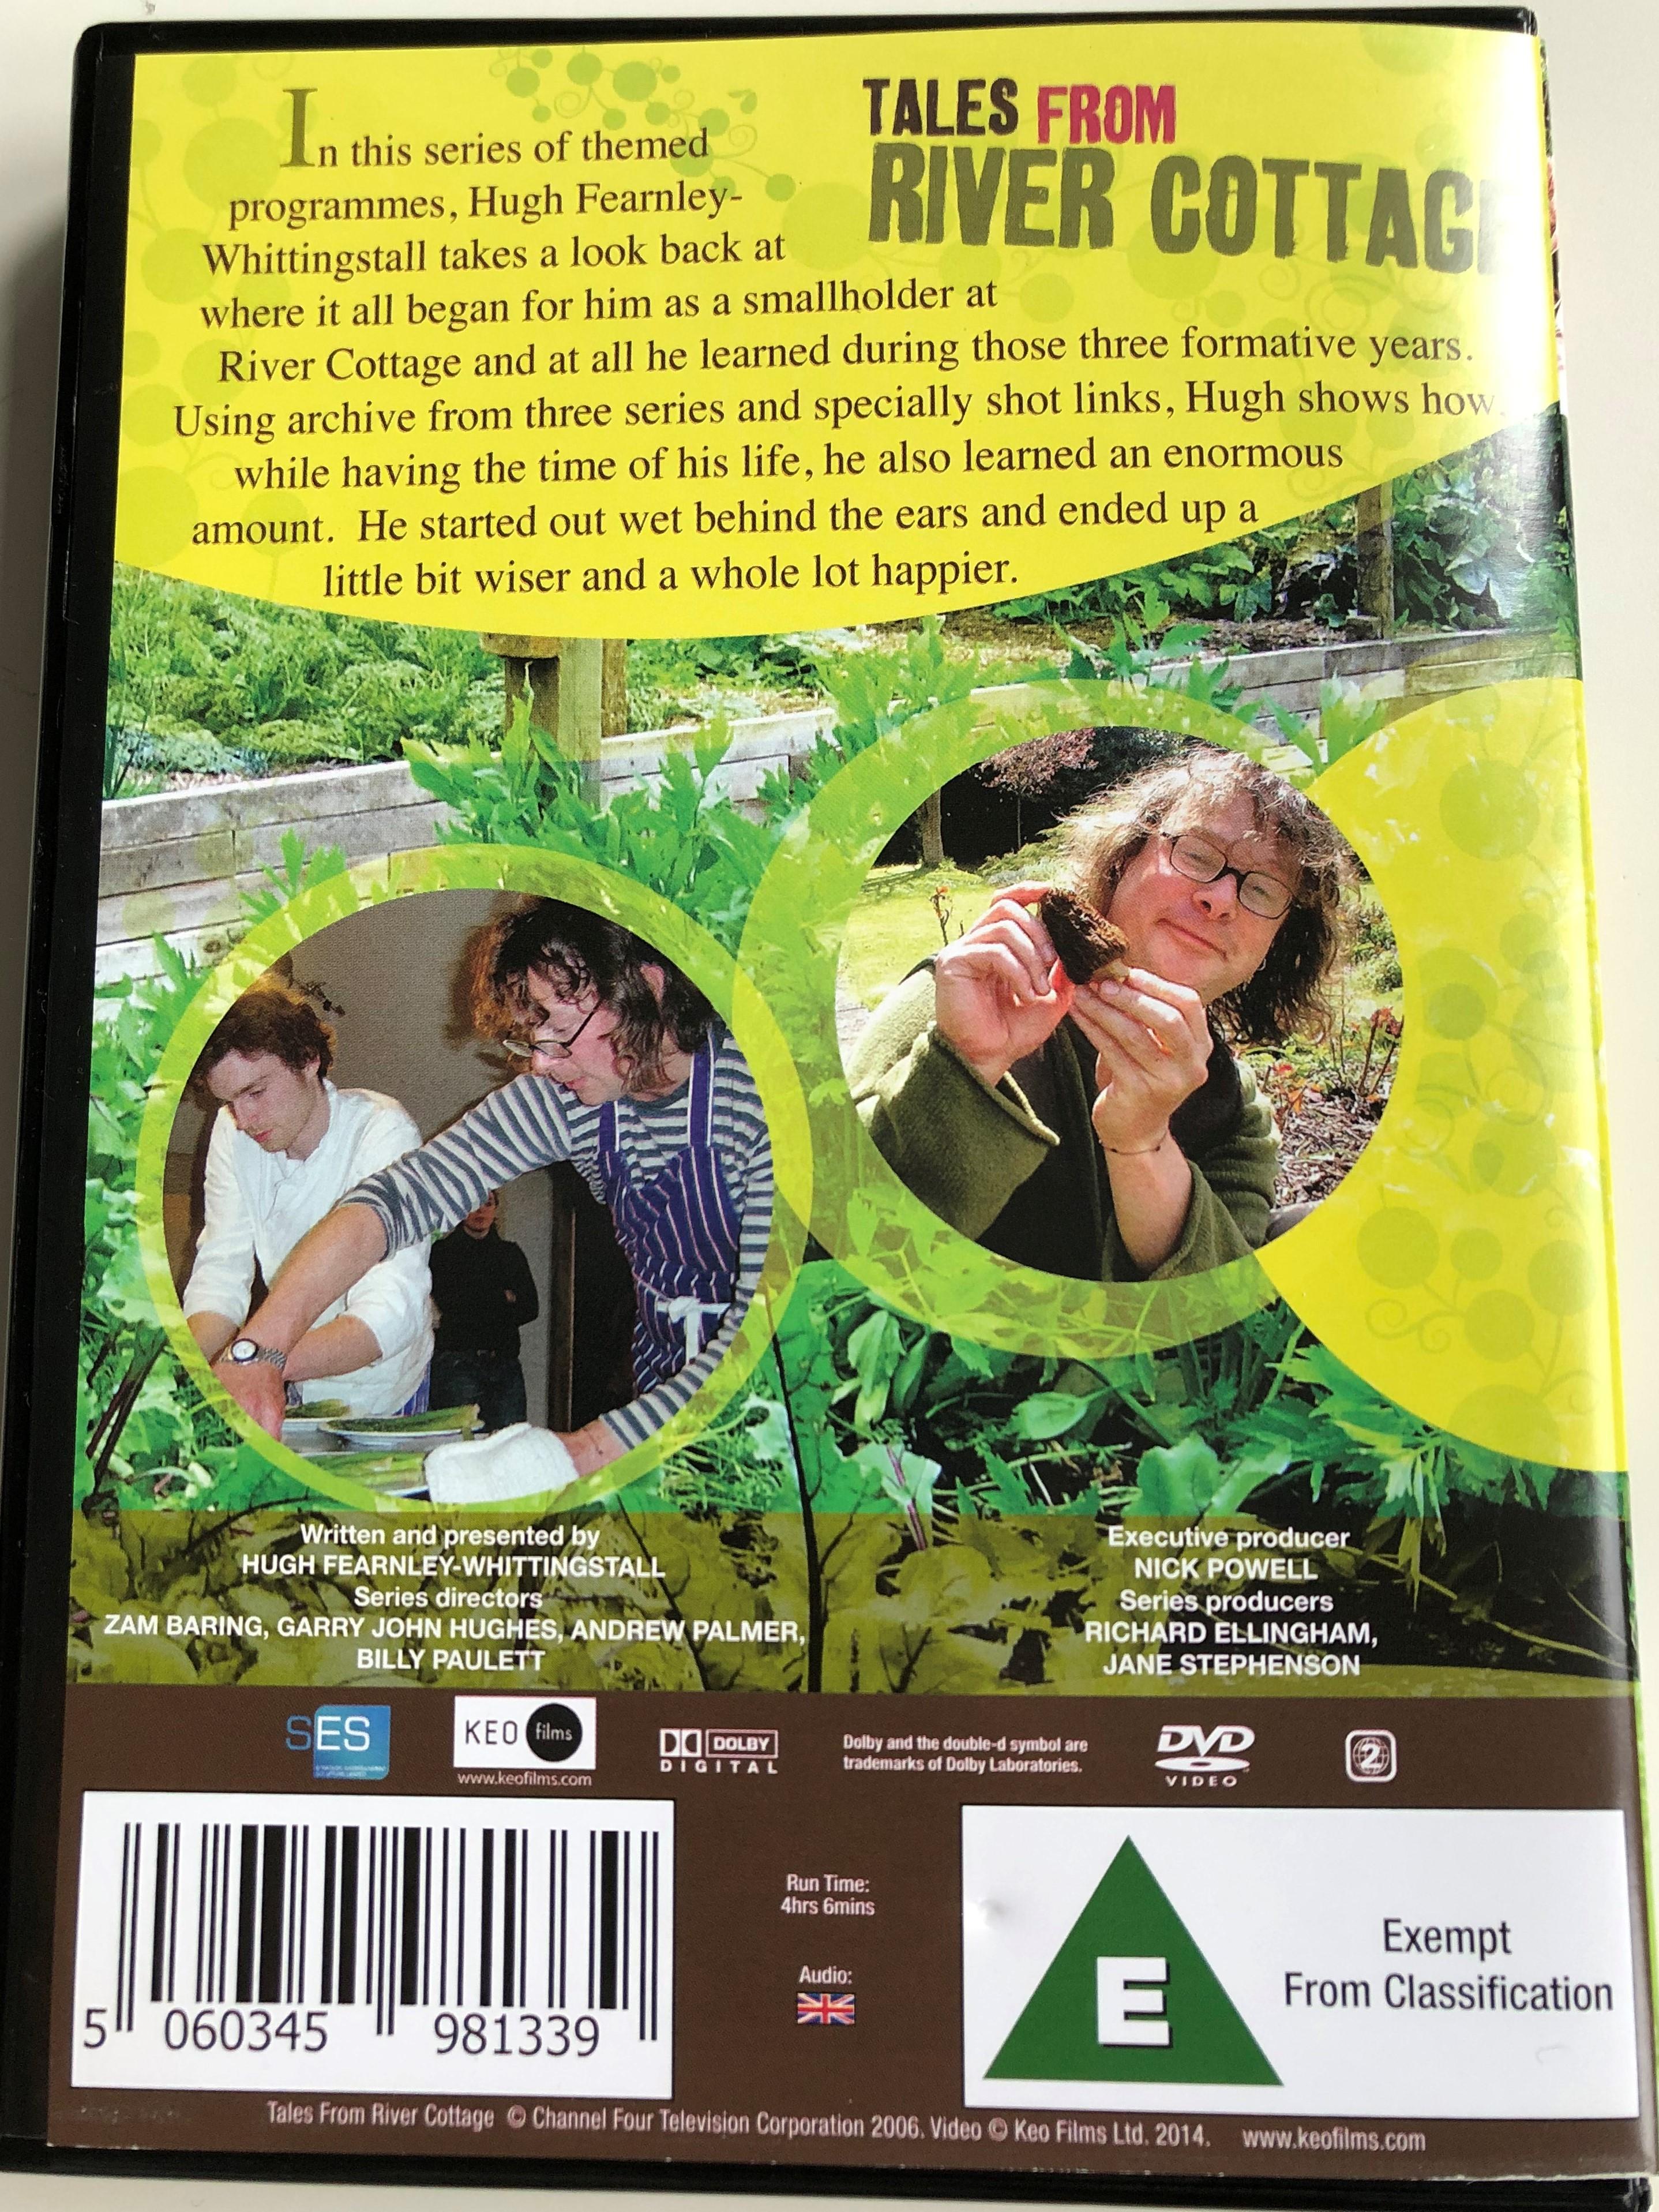 tales-from-river-cottage-dvd-2003-series-directors-zam-baring-garry-john-hughes-andrew-palmer-billy-paulett-3.jpg